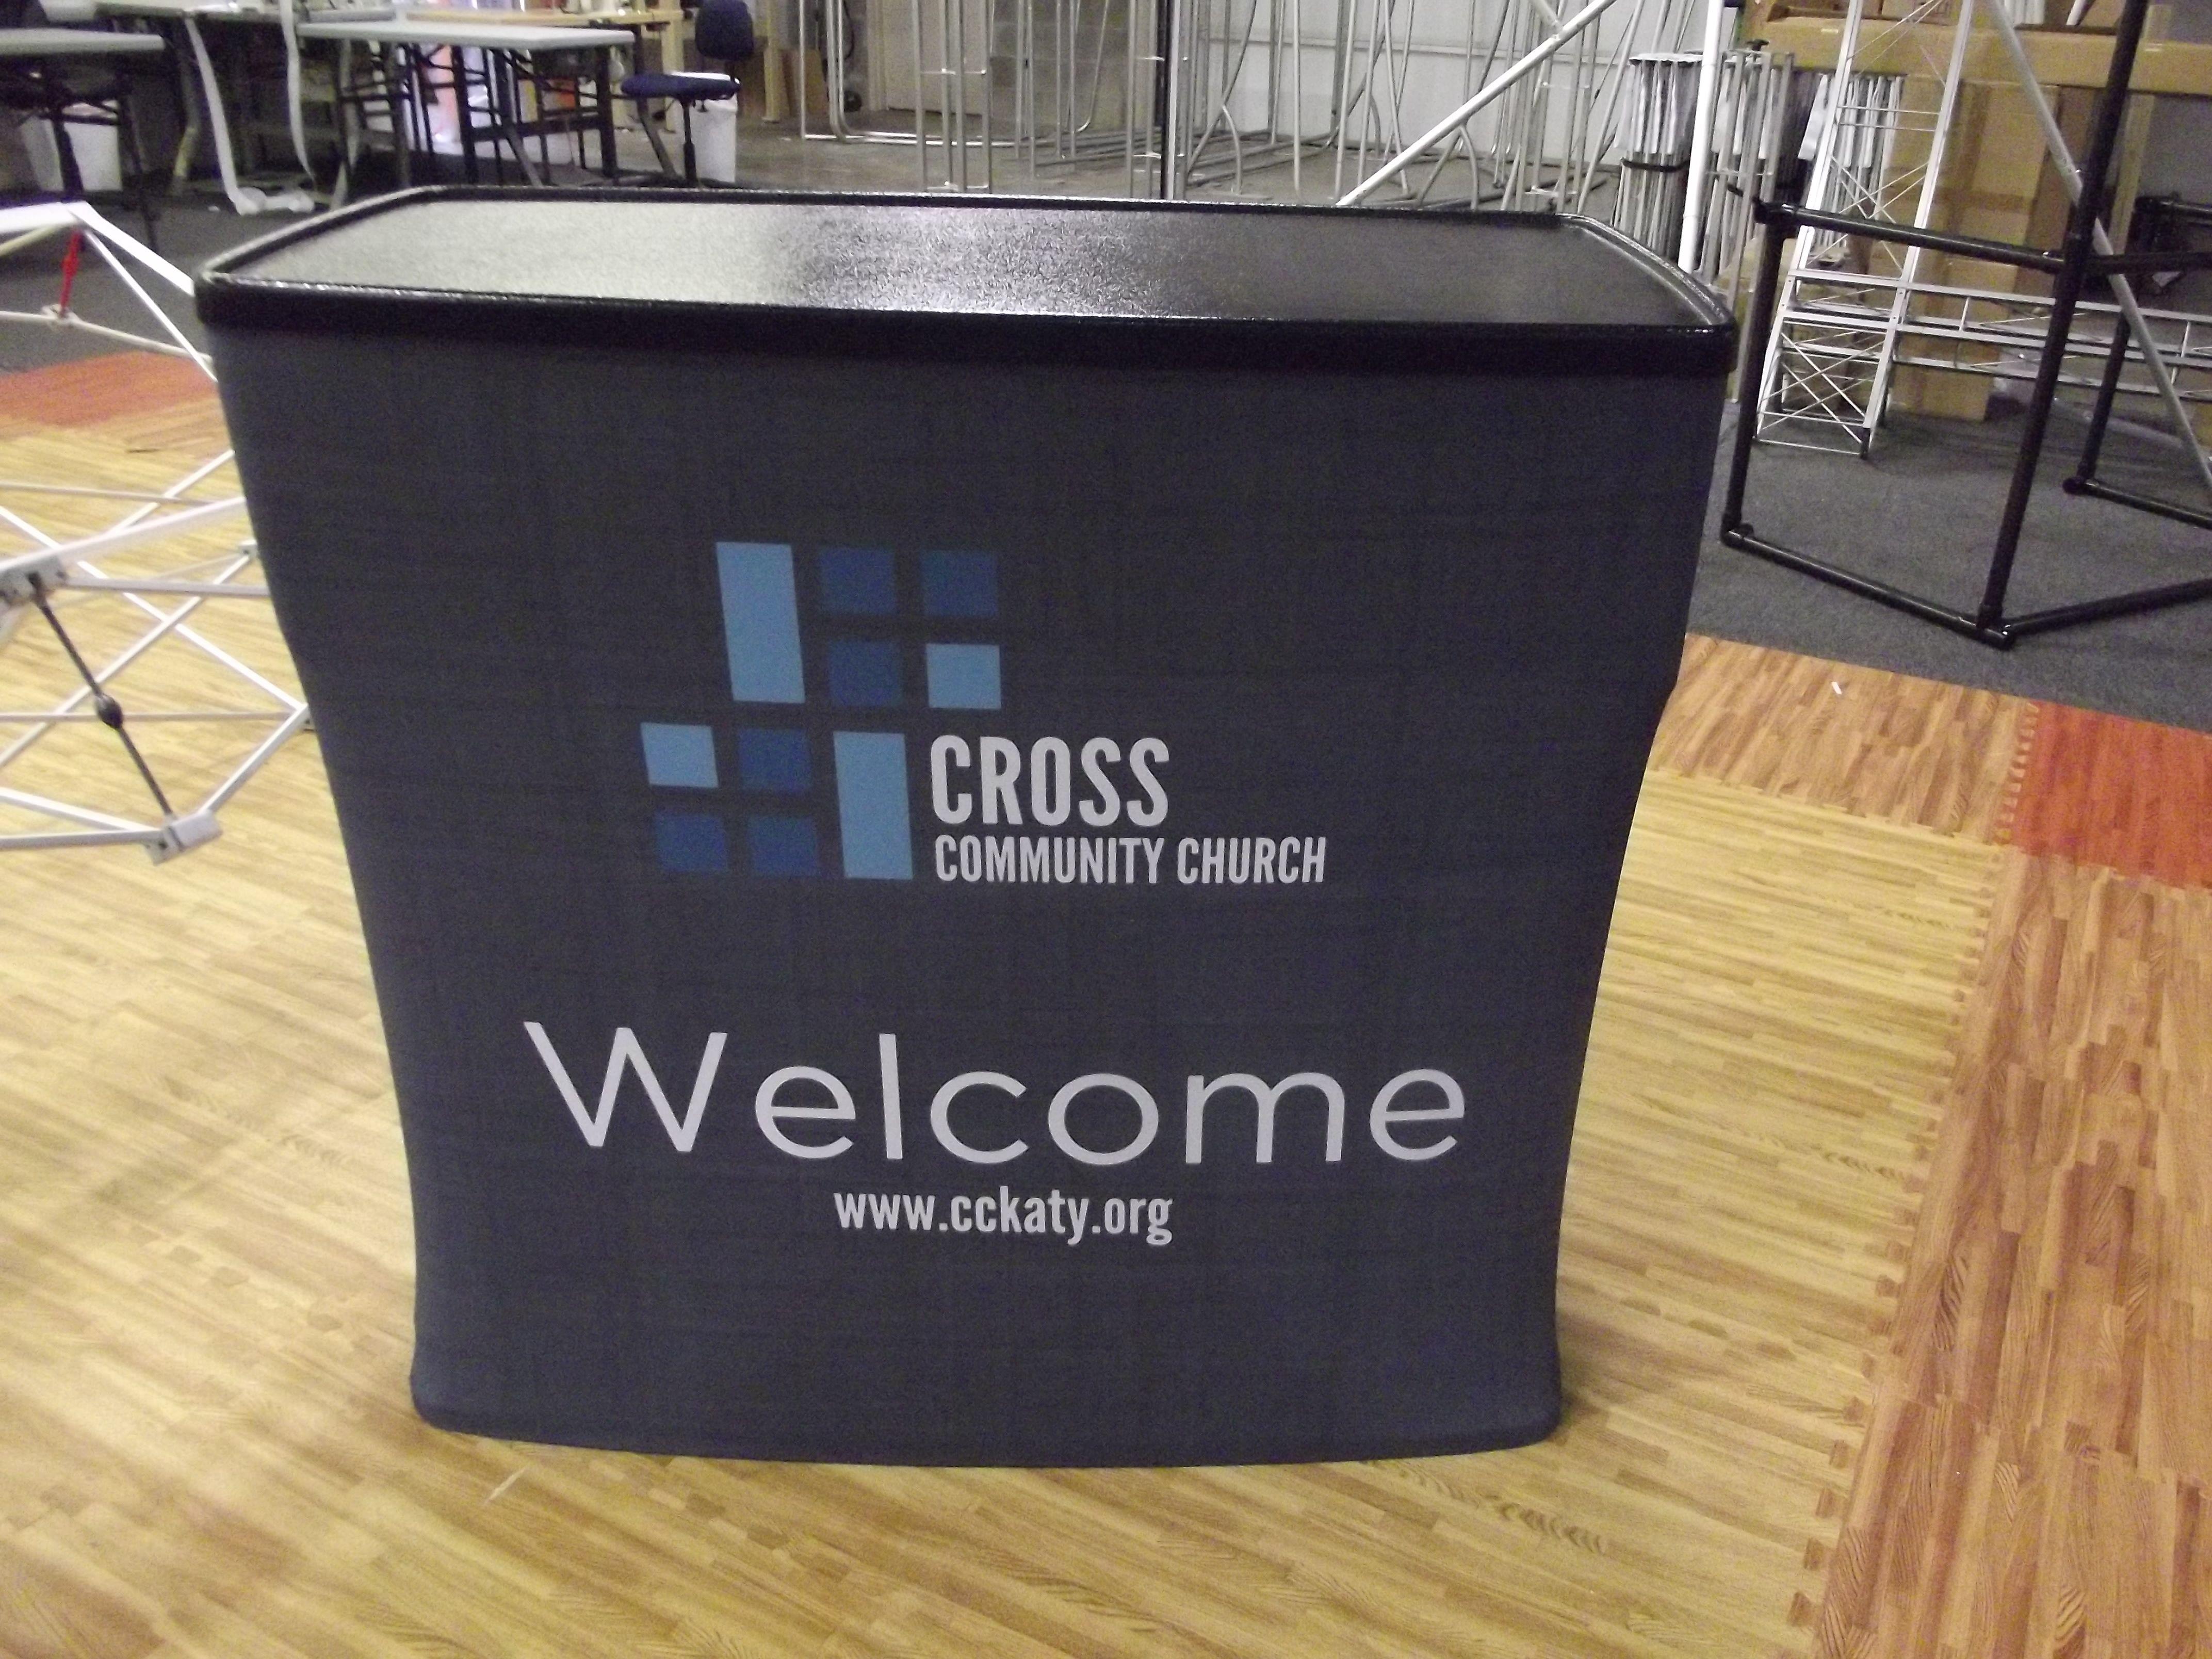 Cross Community Church Katy Tx With